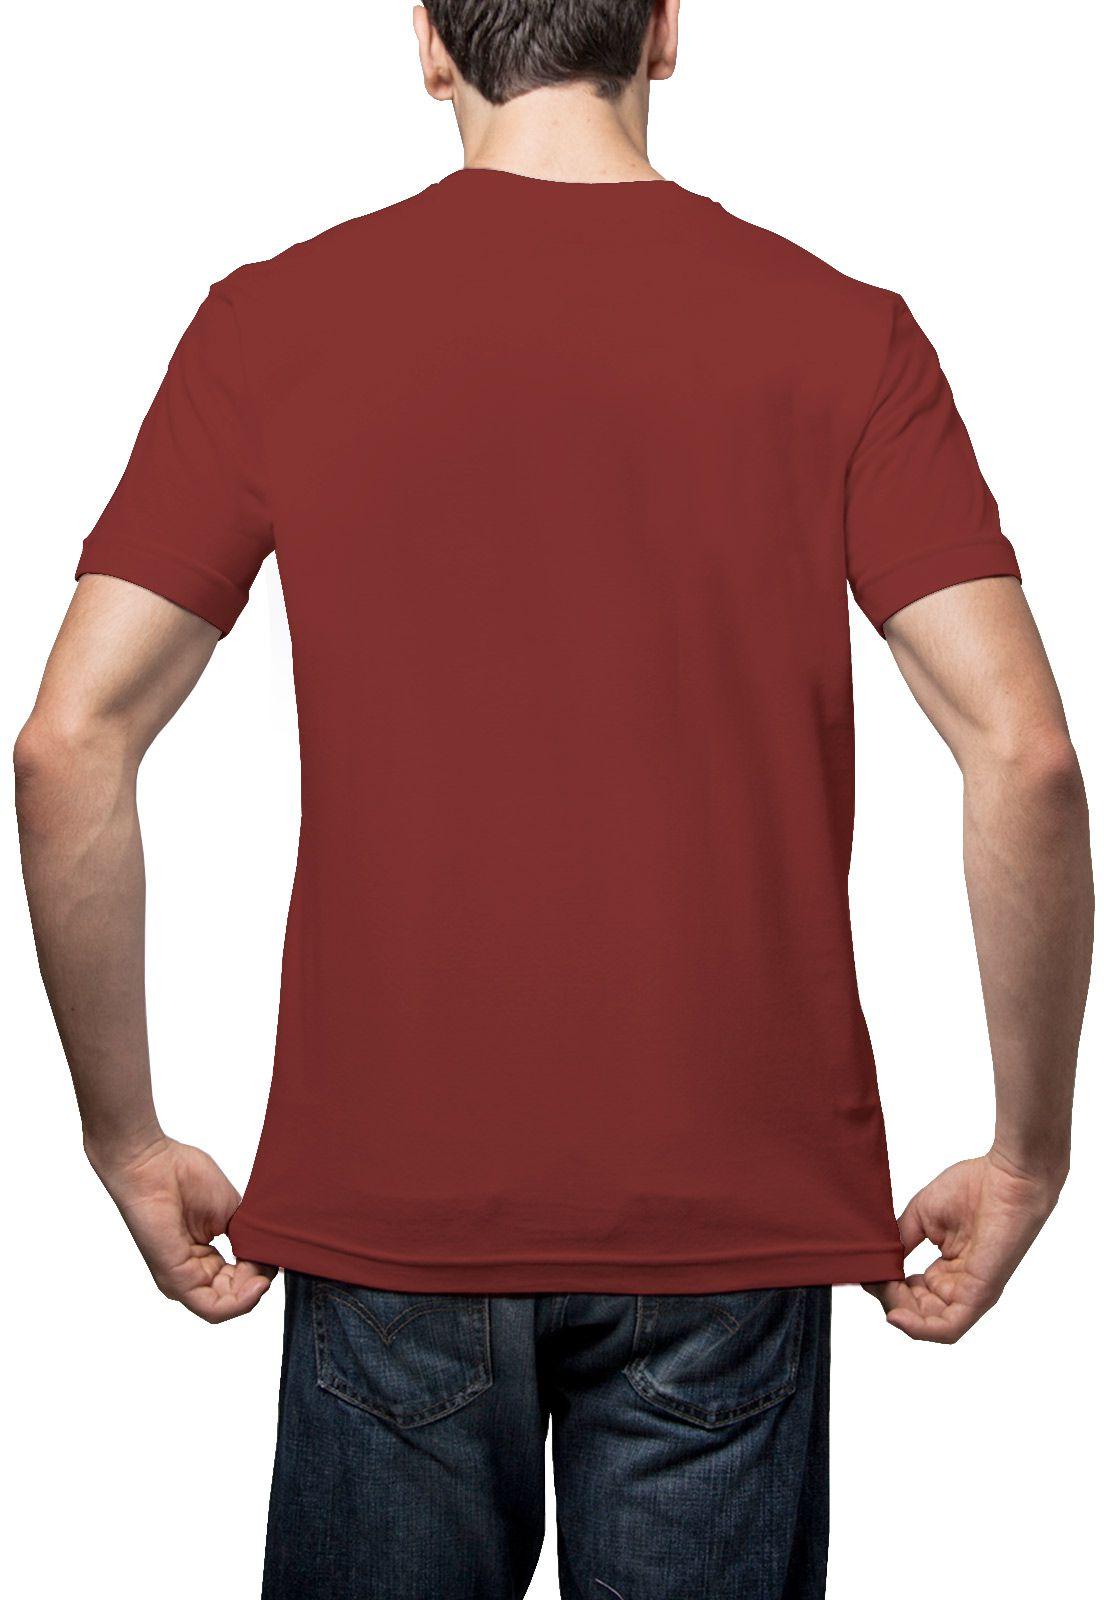 Camiseta Amazônia Básica Árvore Bordada Gola V - Vinho